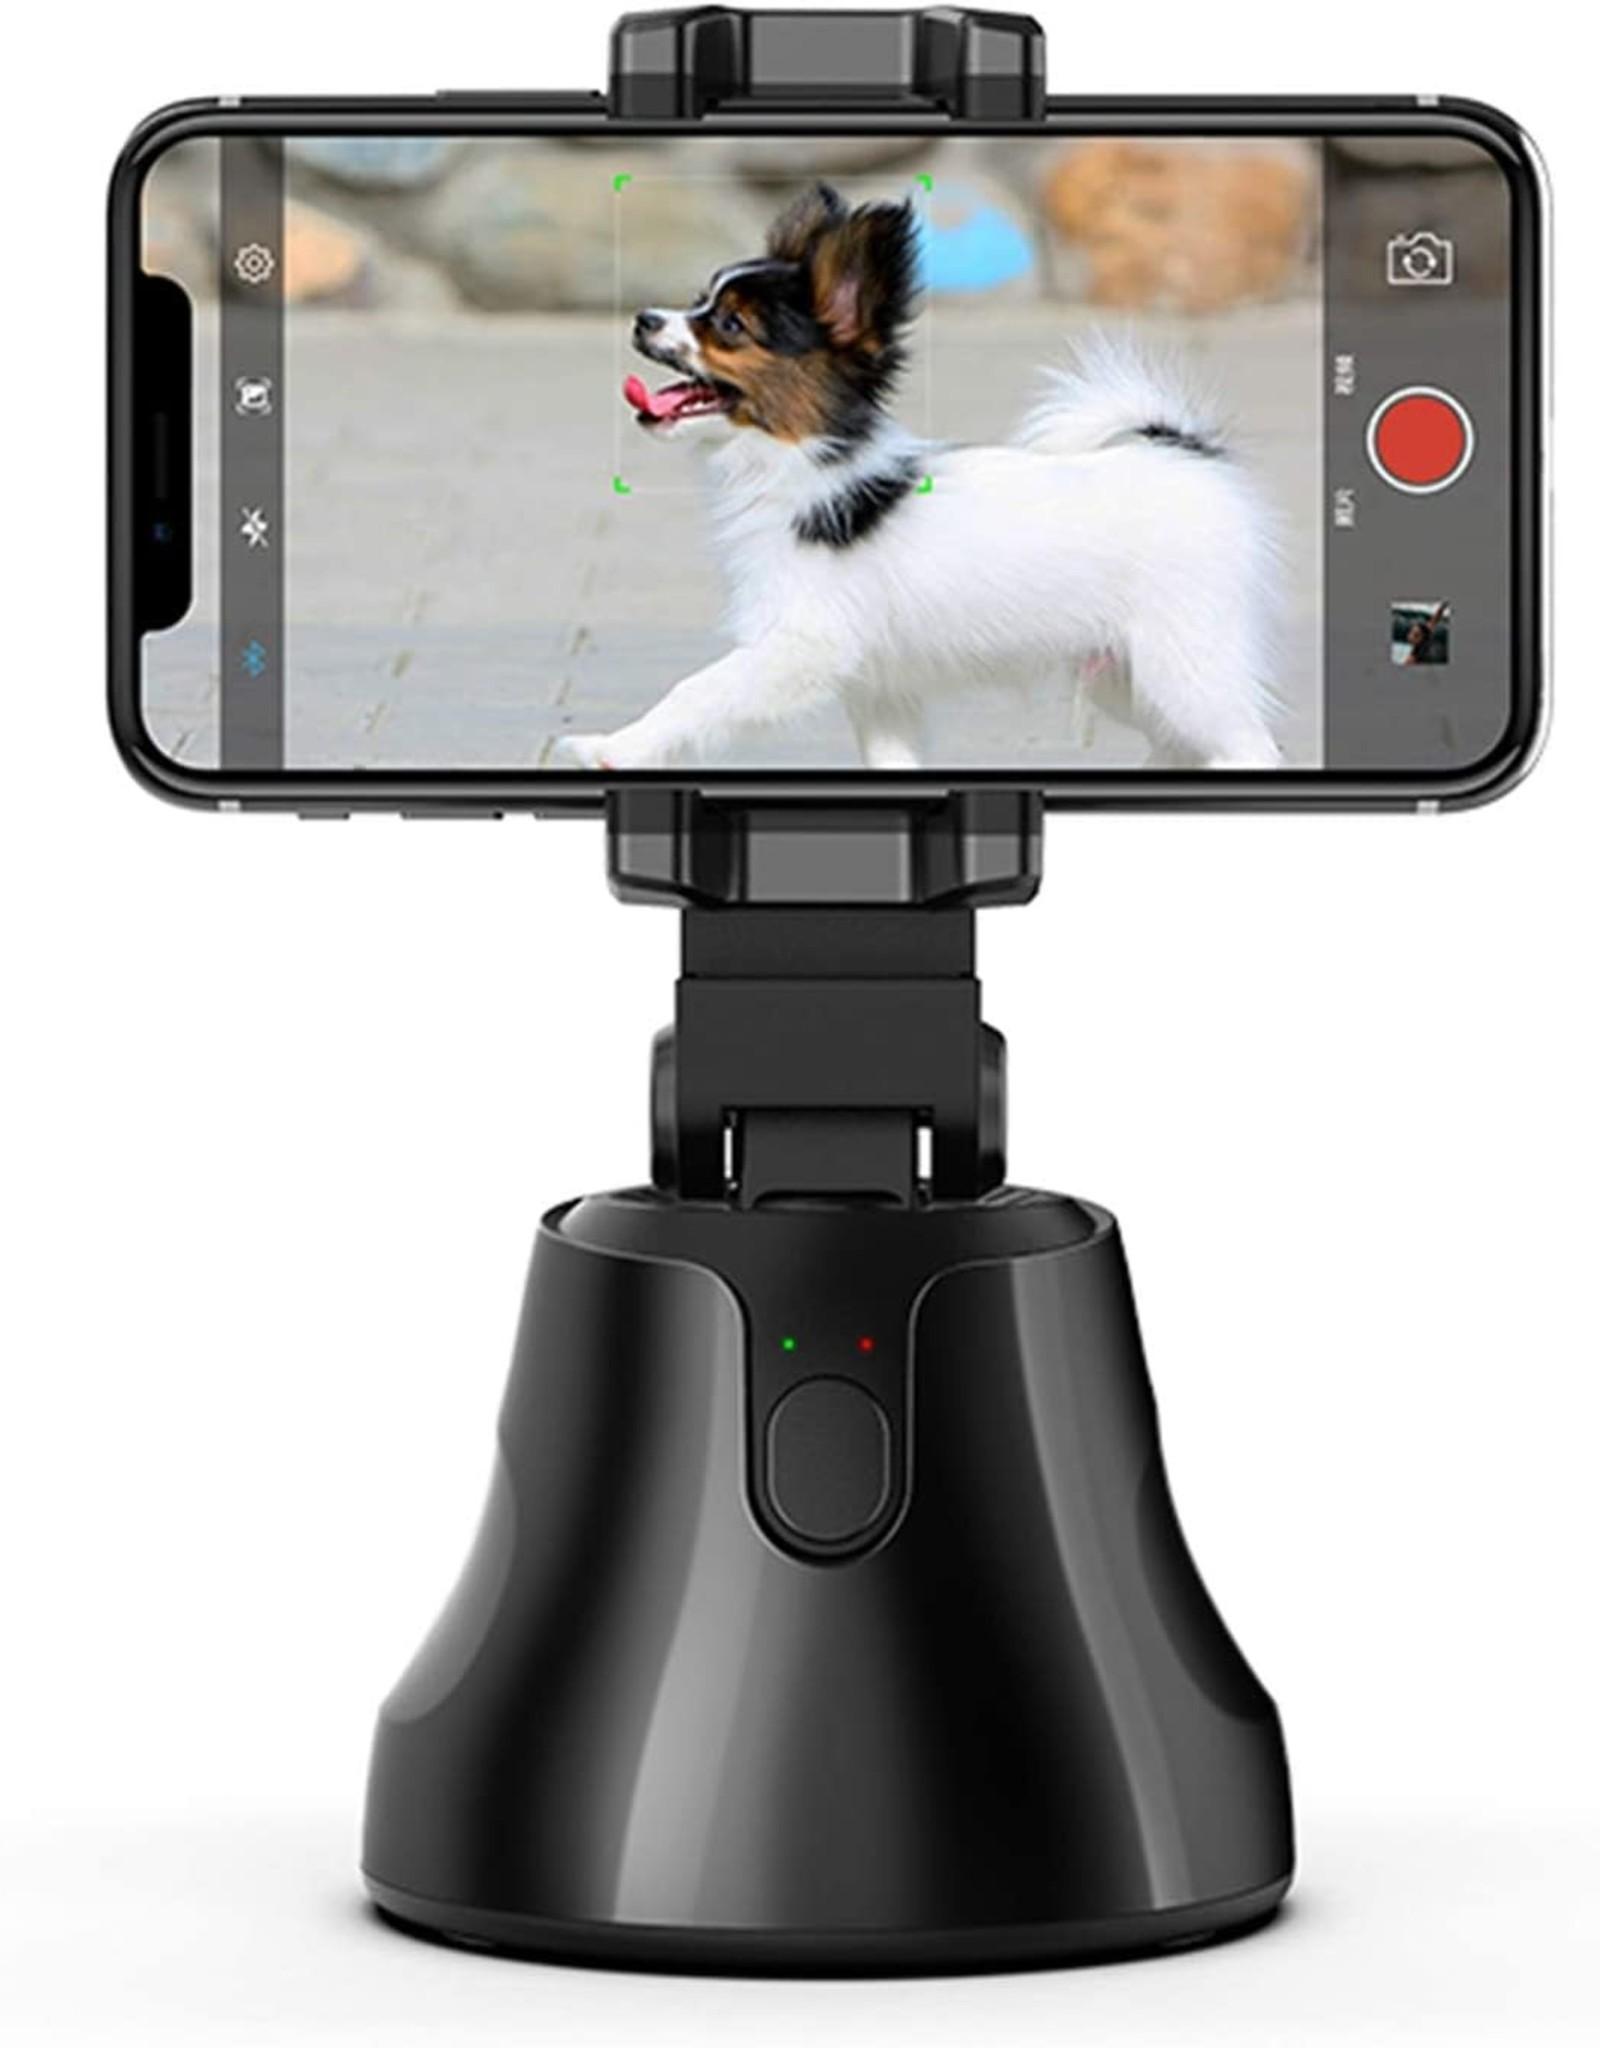 Baseus Baseus Selfie Smart Auto Shooting Stick  Genie 360°Intelligent Object Tracking Holder Black